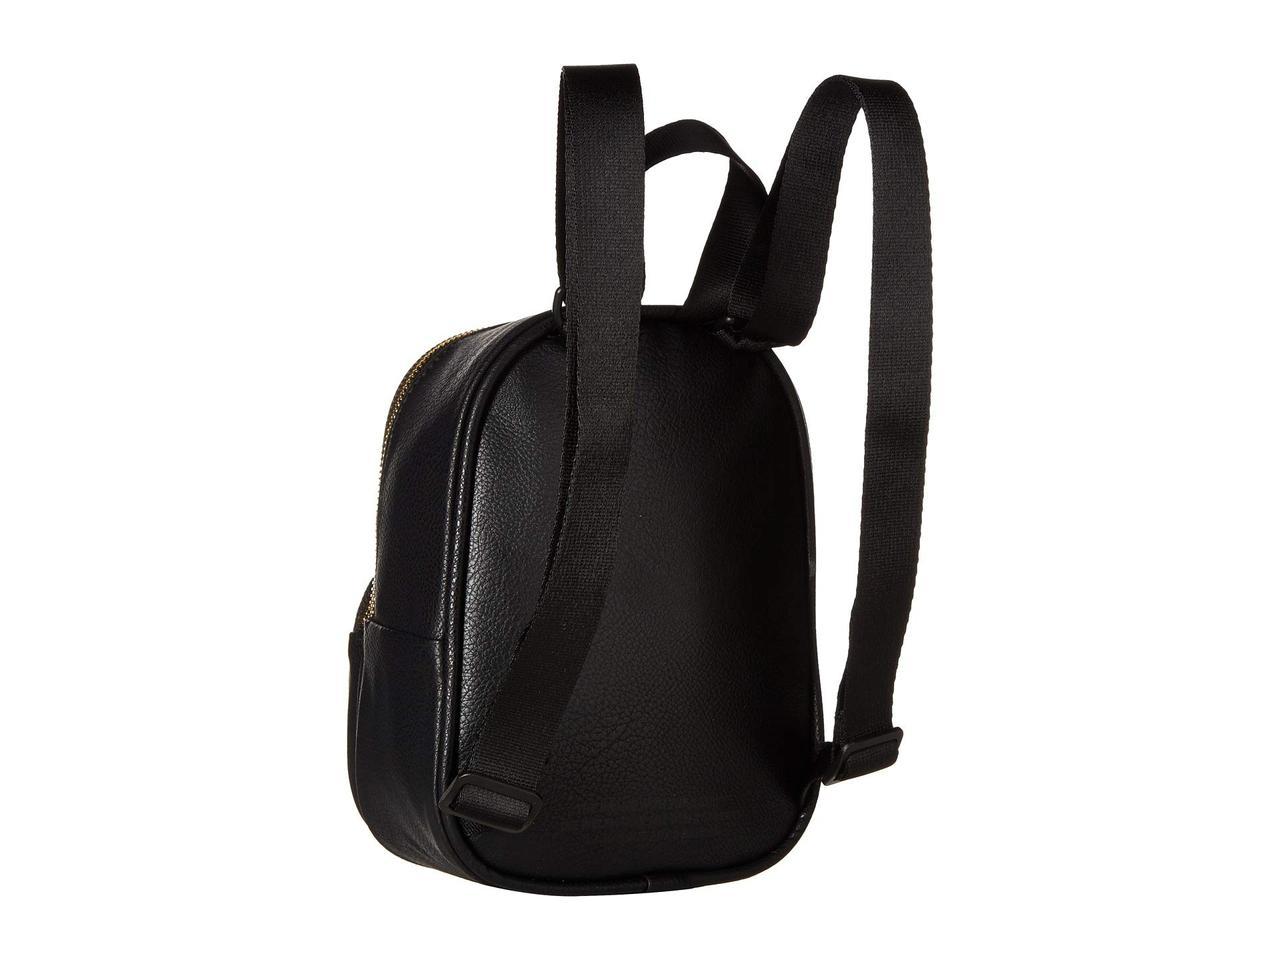 official photos 38b0c 3f173 Рюкзак (Оригинал) adidas Originals Originals Mini PU Leather Backpack  Black Gold, ...